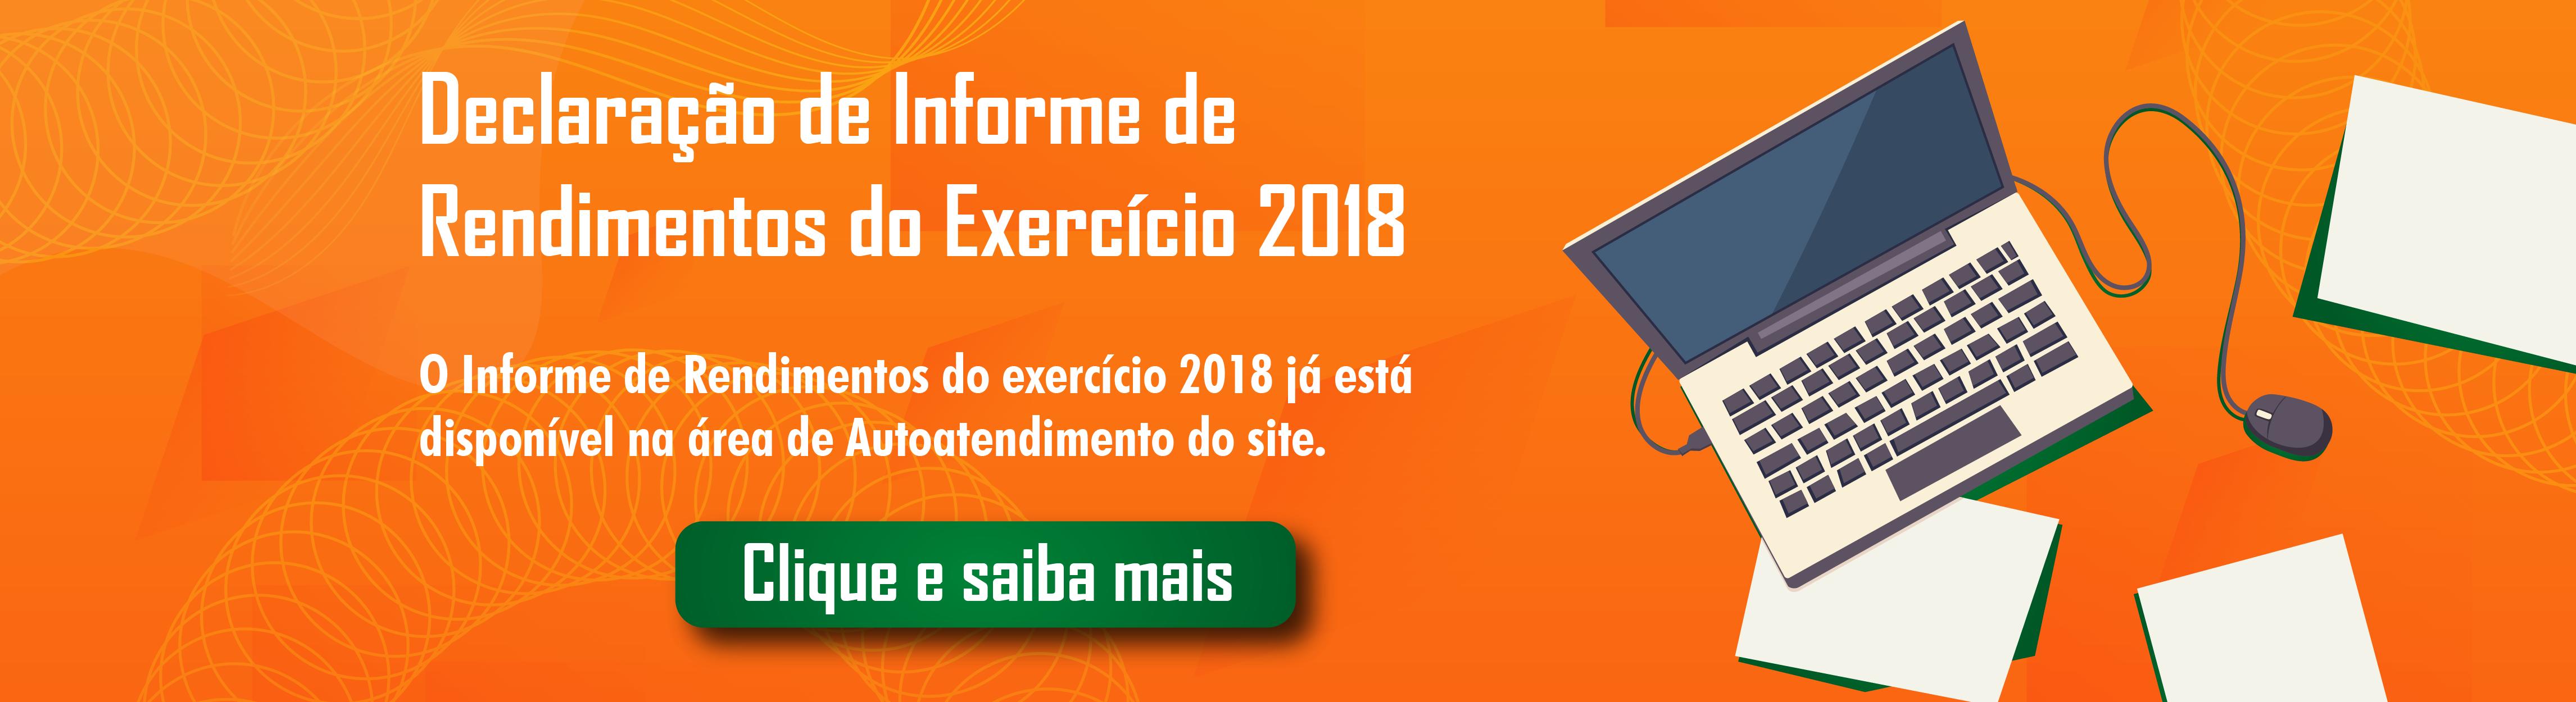 2019-informe-de-rendimentos-banner